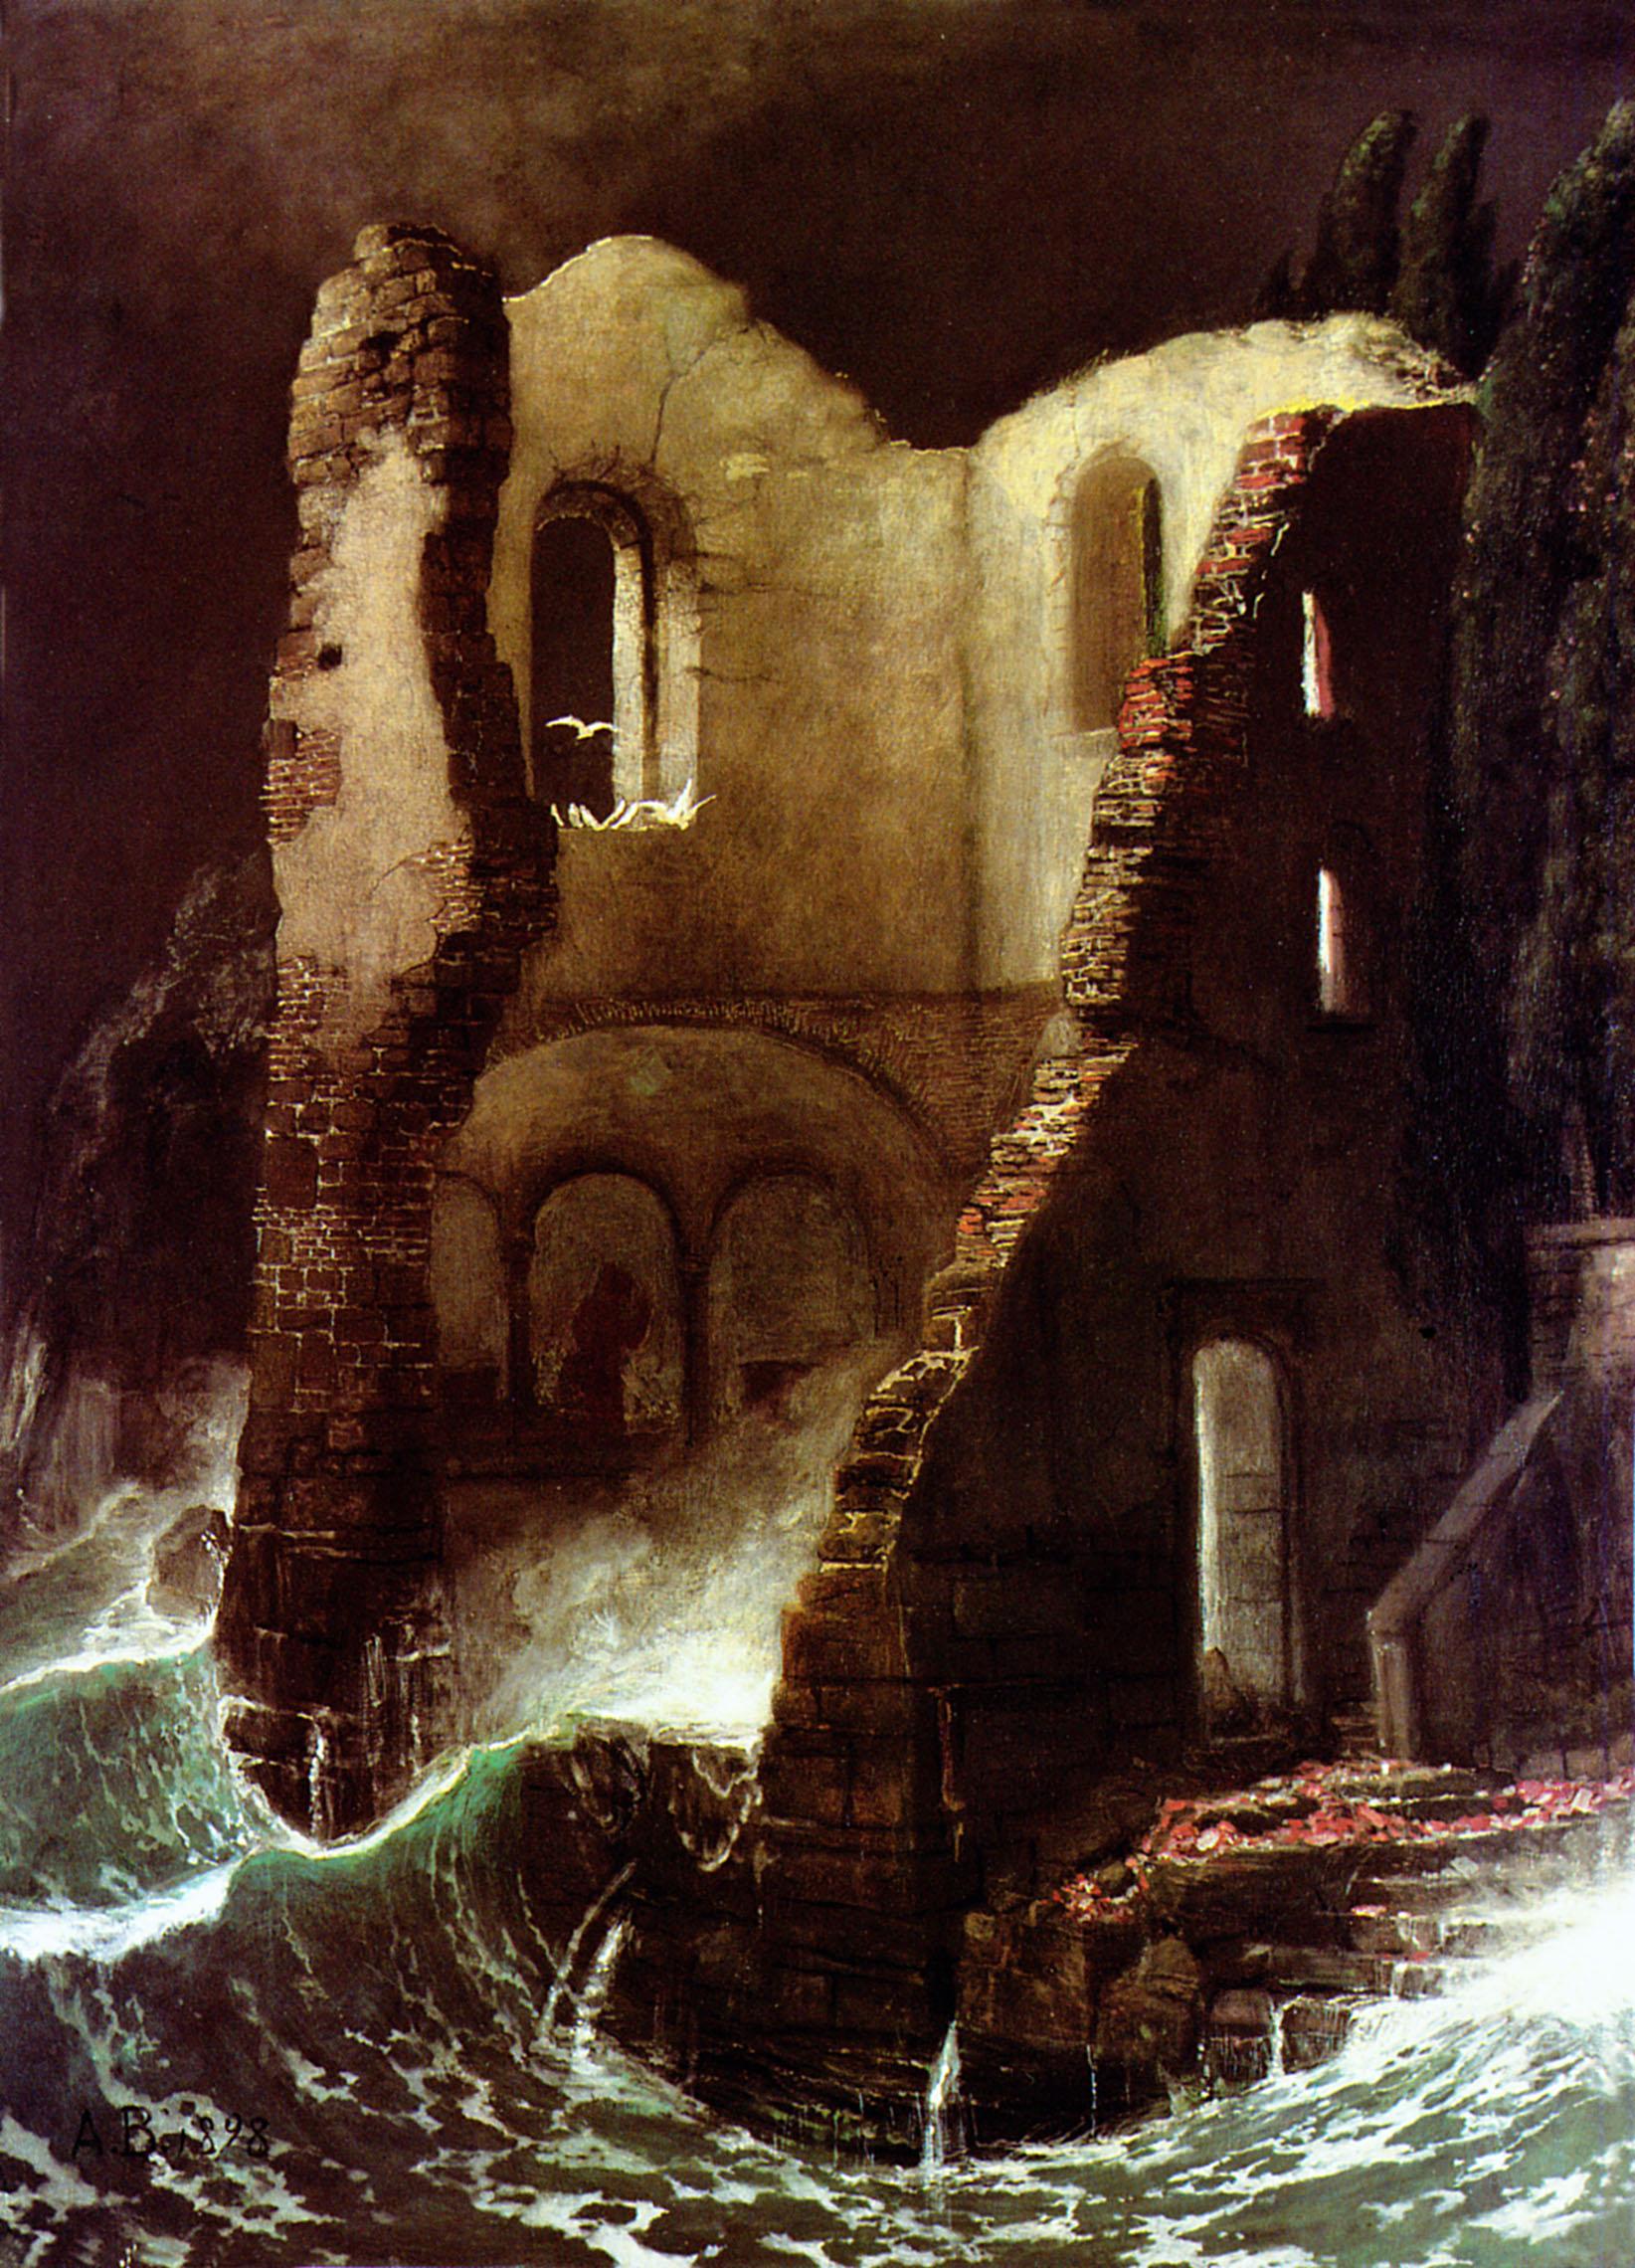 Die Kapelle (1898) oil on canvas 94.5 x 70.5 cm